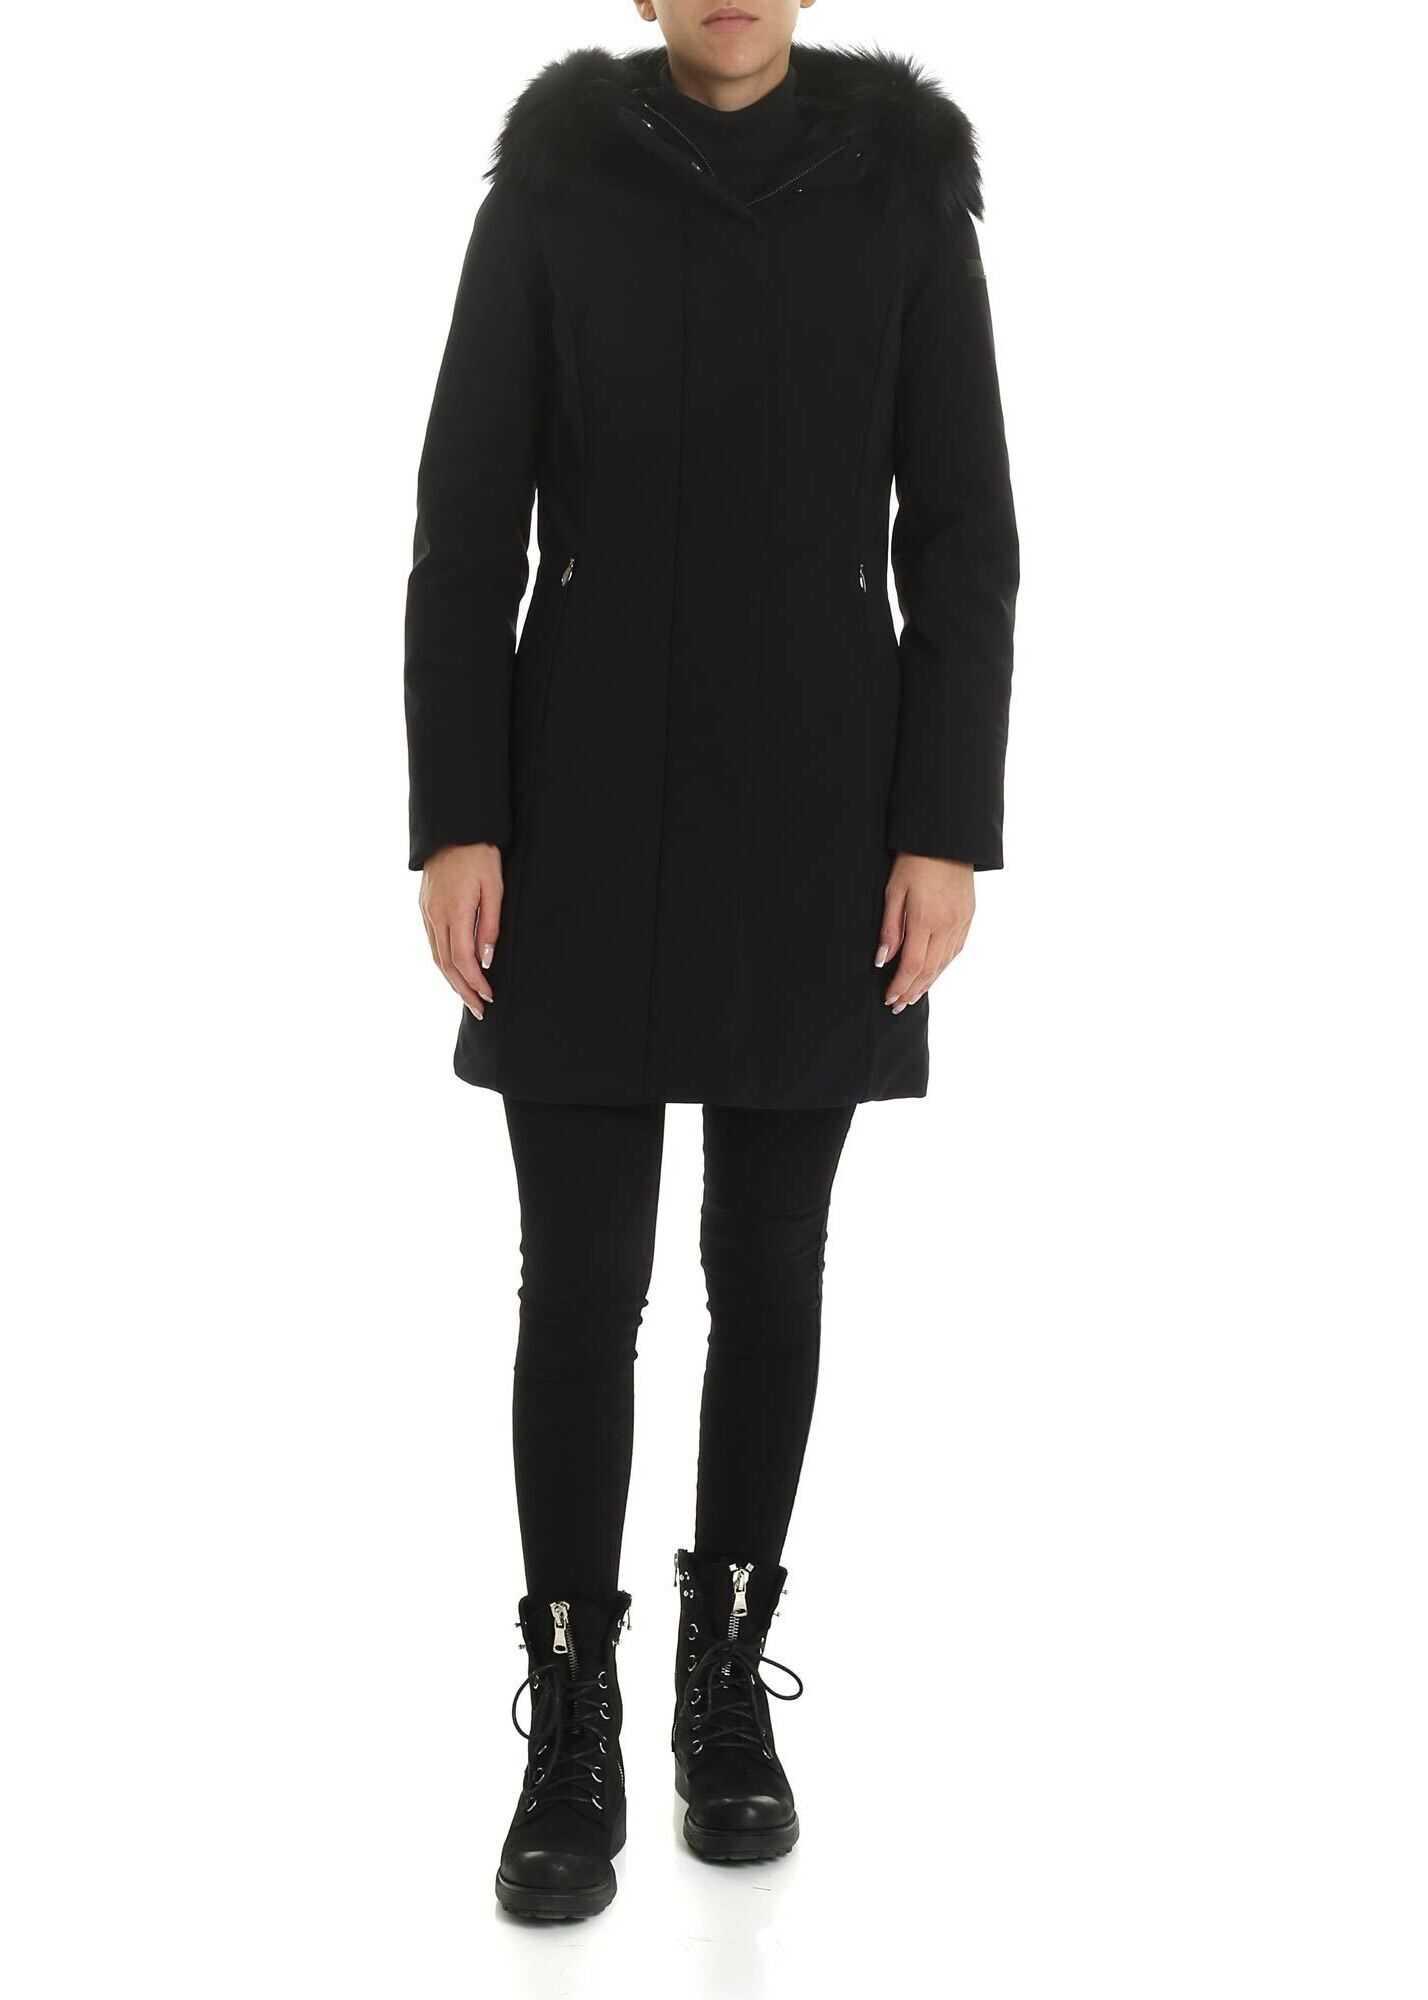 RRD Roberto Ricci Designs Winter Long Fur Down Jacket In Black Black